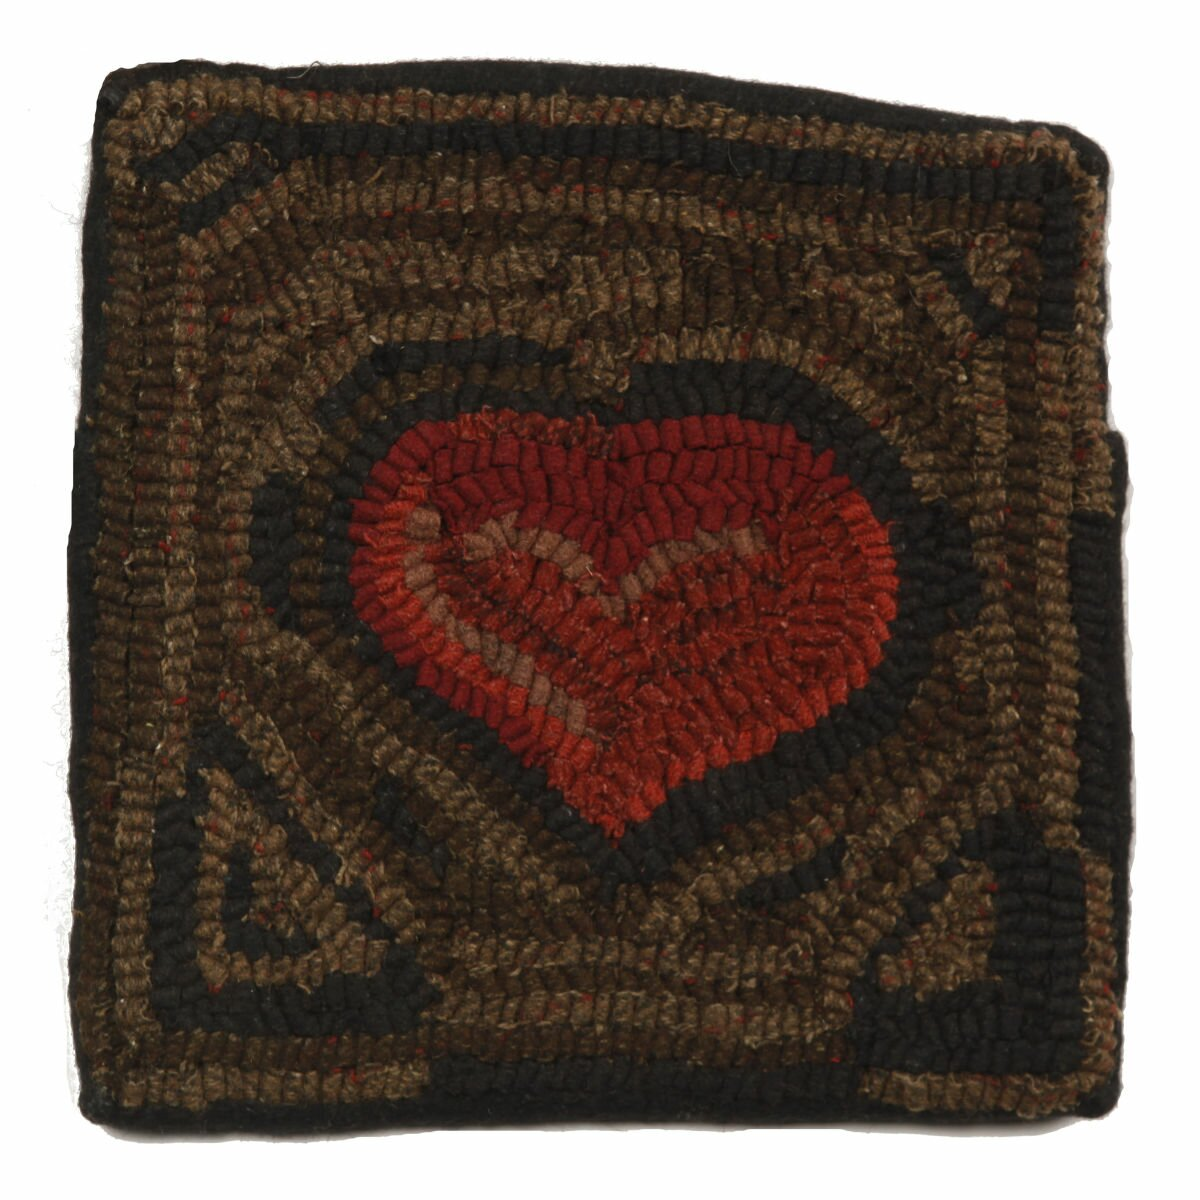 Homespice Decor Primitive Handcrafted Throw Pillow & Reviews Wayfair